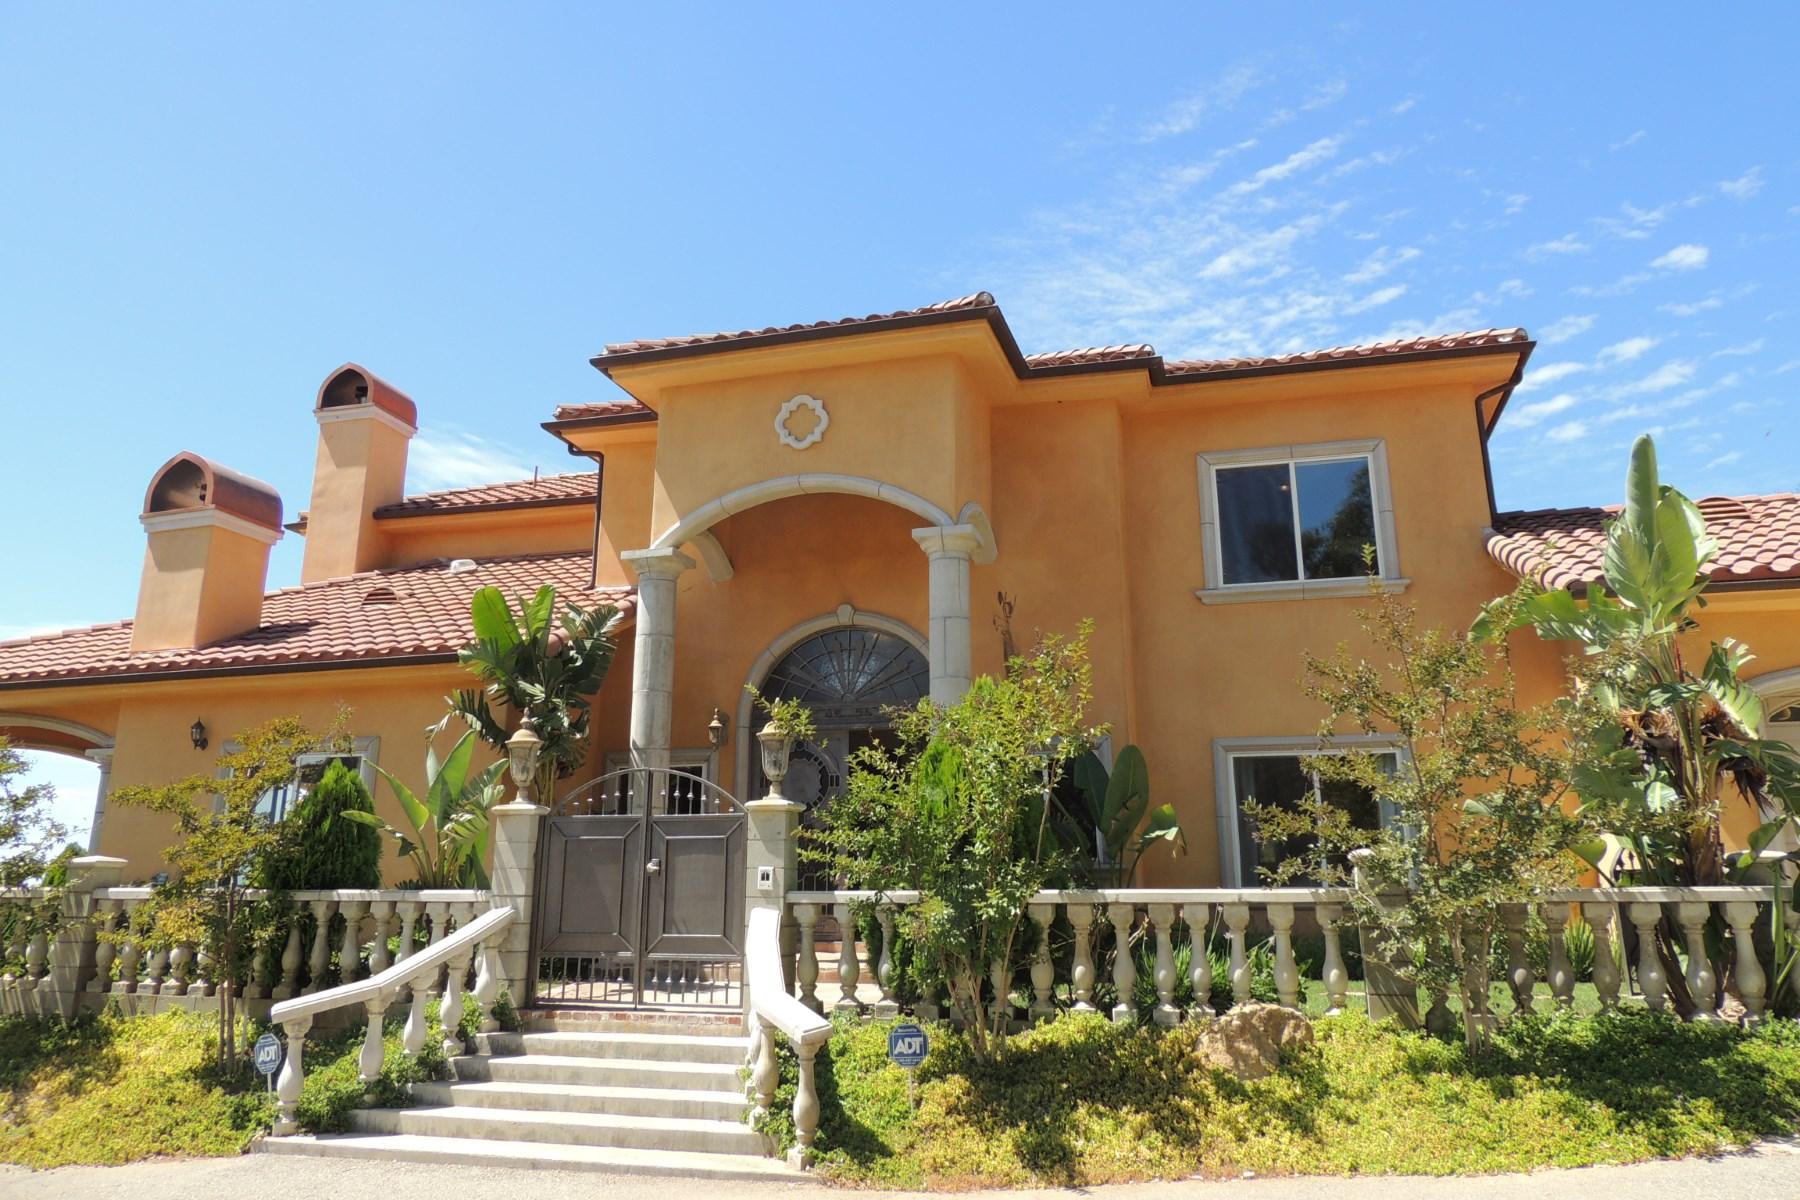 Single Family Home for Sale at Breathtaking, Panoramic Ocean Views 2210 Mar Vista Ridge Drive Malibu, California 90265 United States